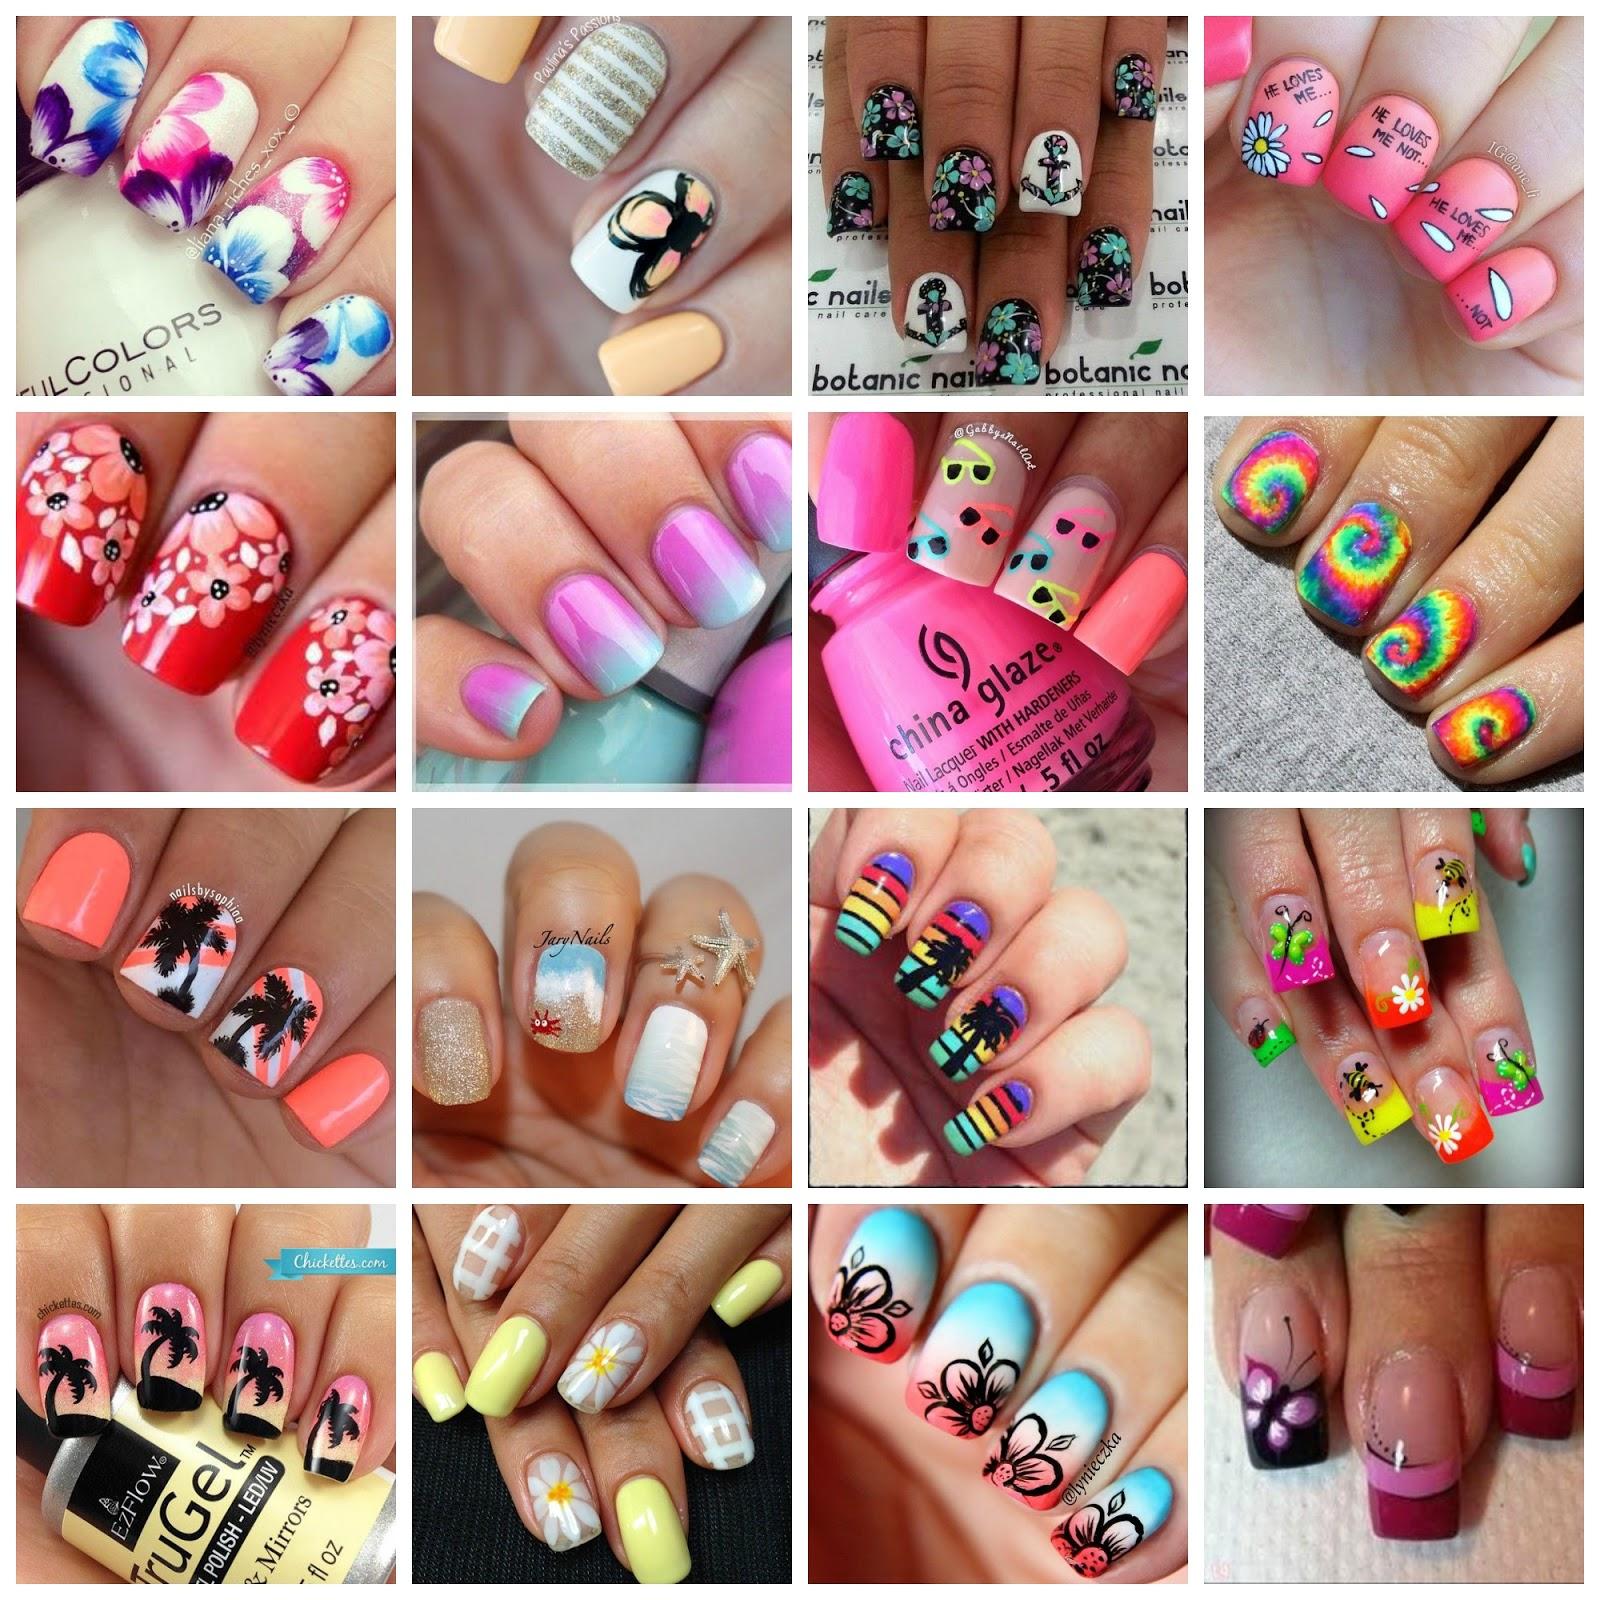 Creativenails4fun: ~Inspiration~ 20 Fantastic Summer Nail arts!